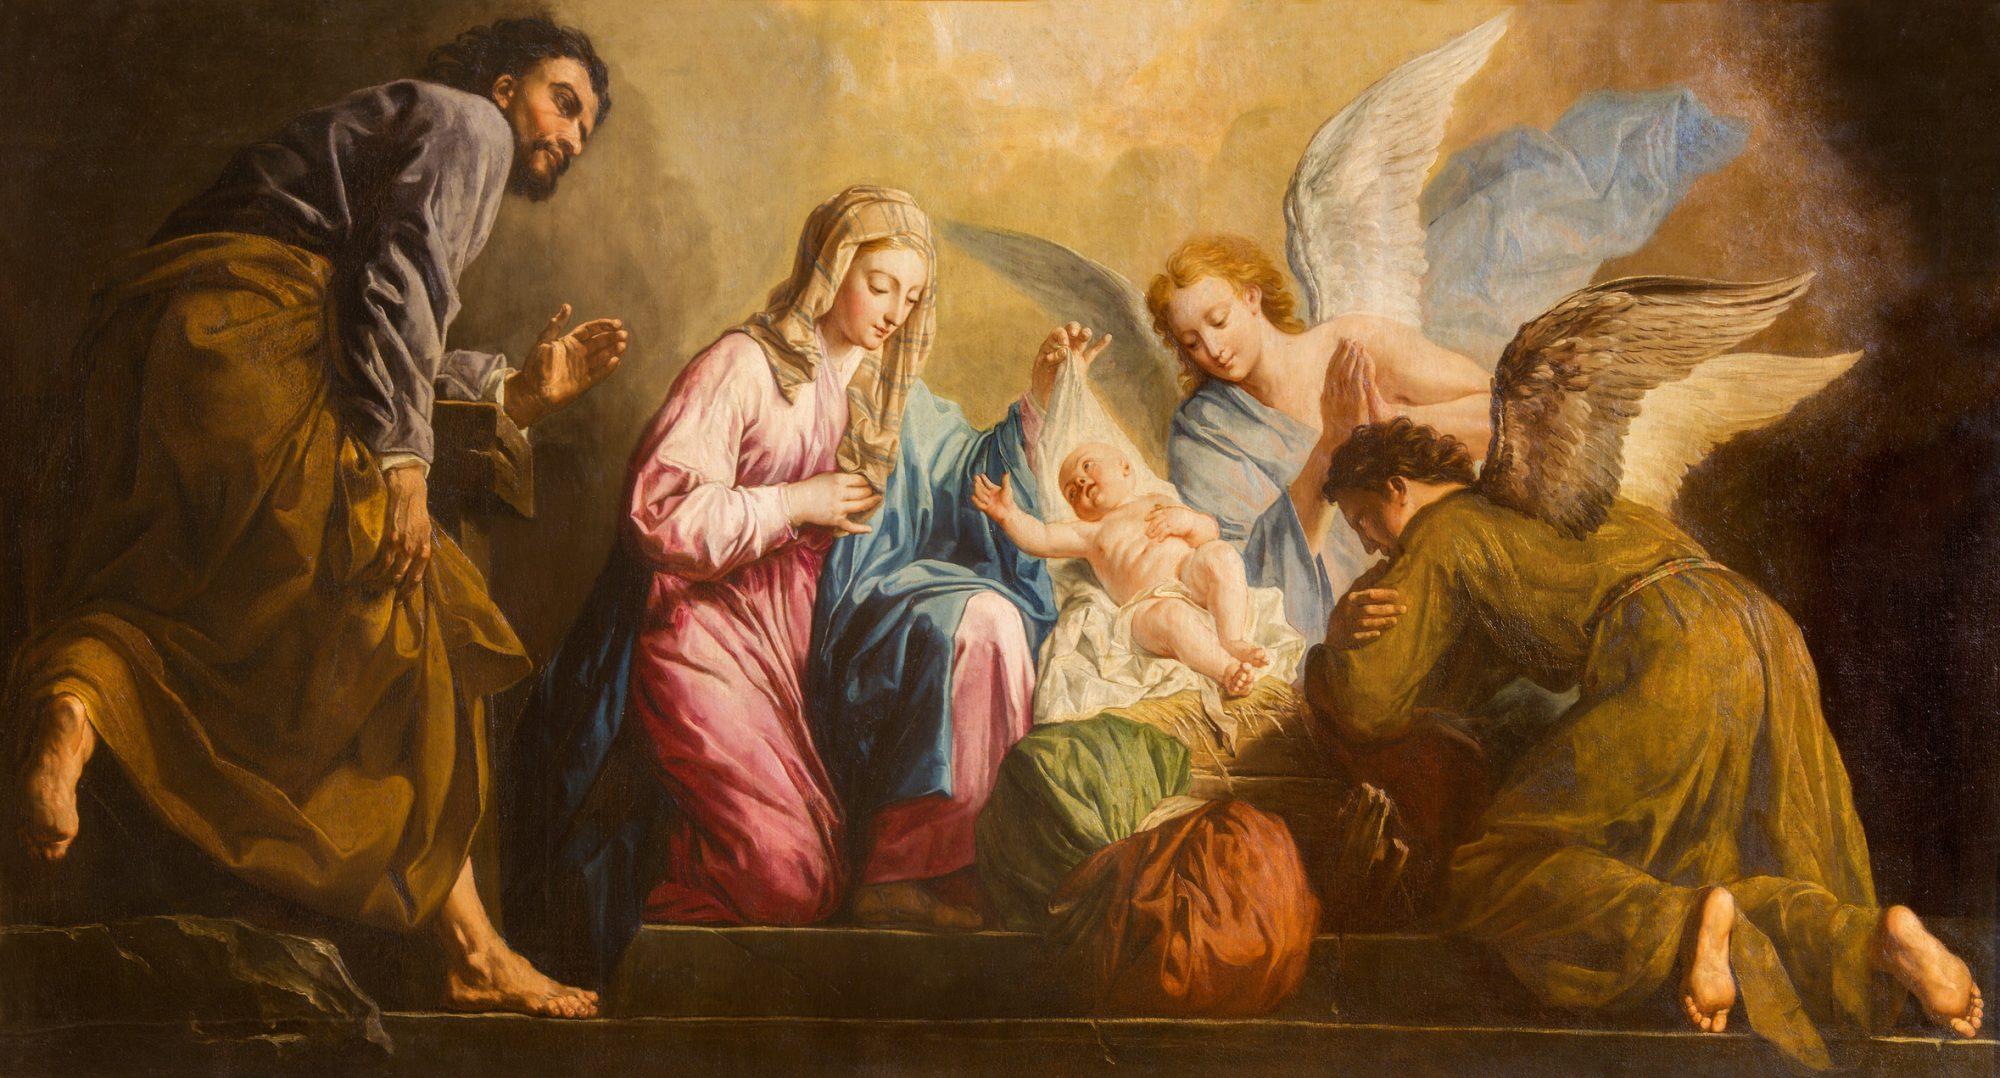 Who was St. Joseph?